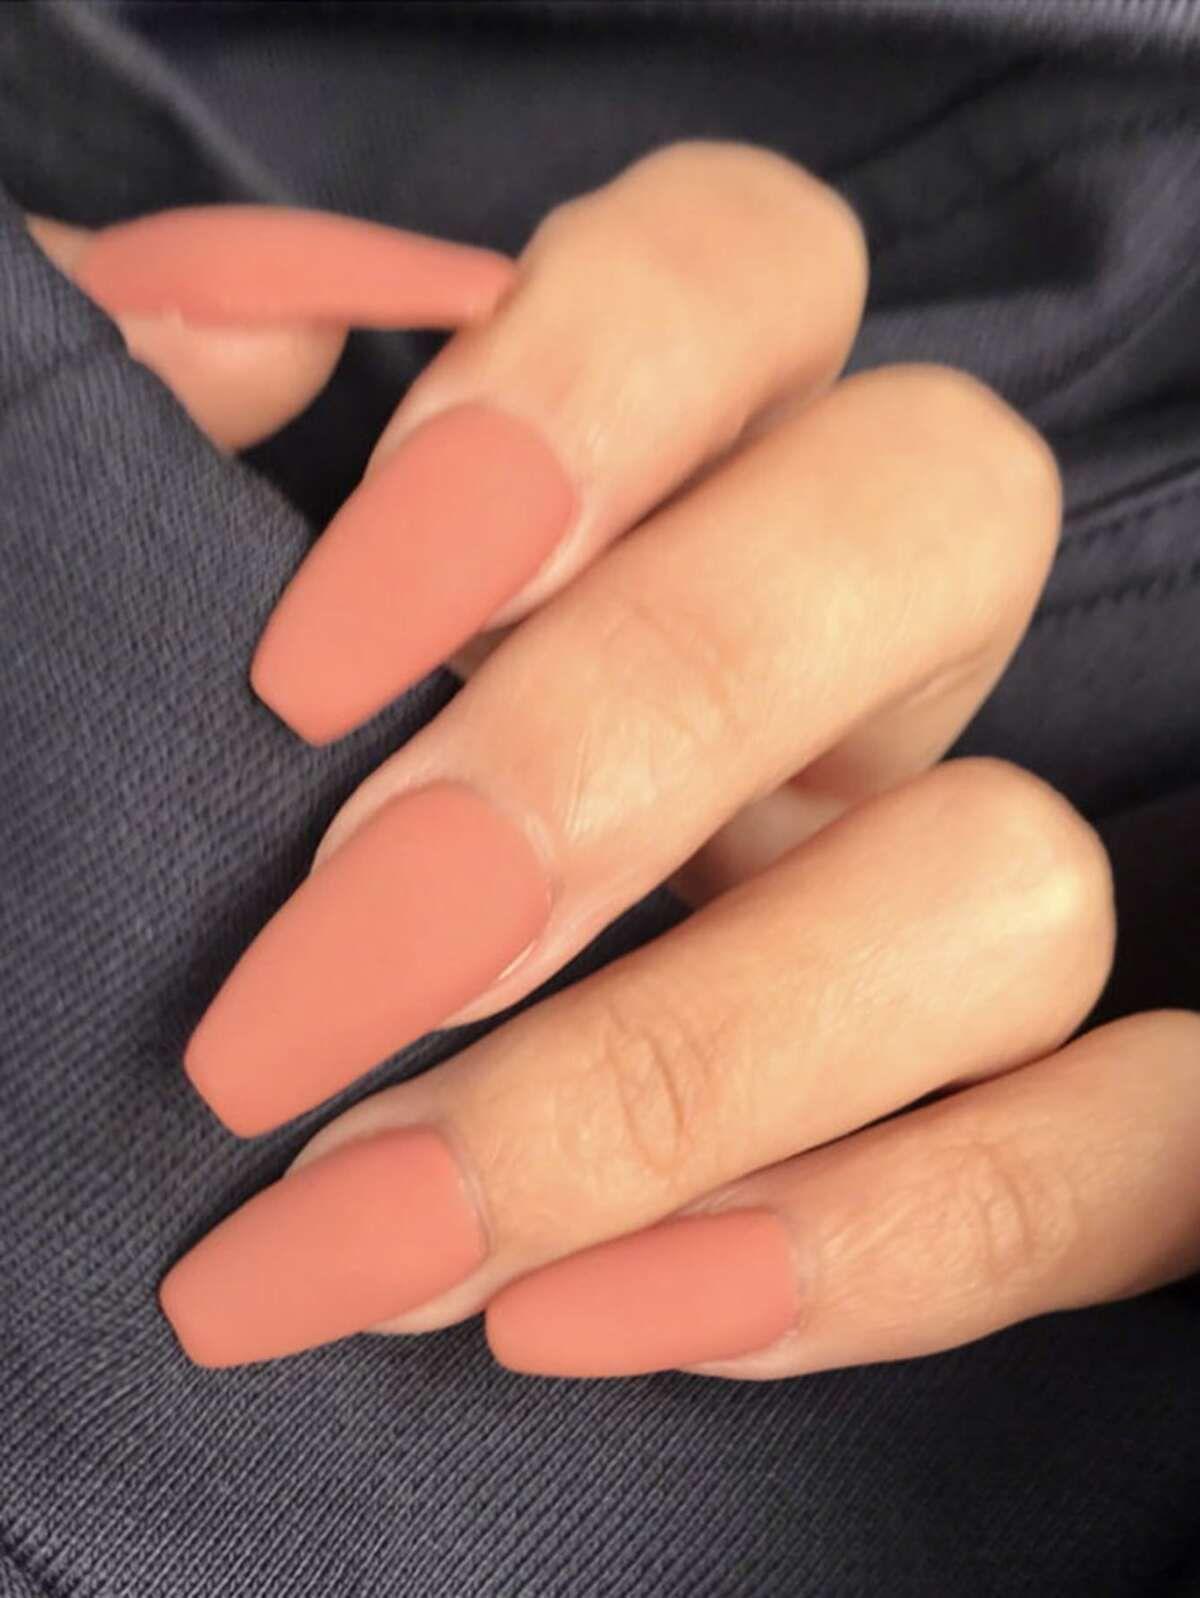 24pcs Plain Fake Nails 1pc Double Sided Tape Plain Acrylic Nails Nail Tips Nail Manicure